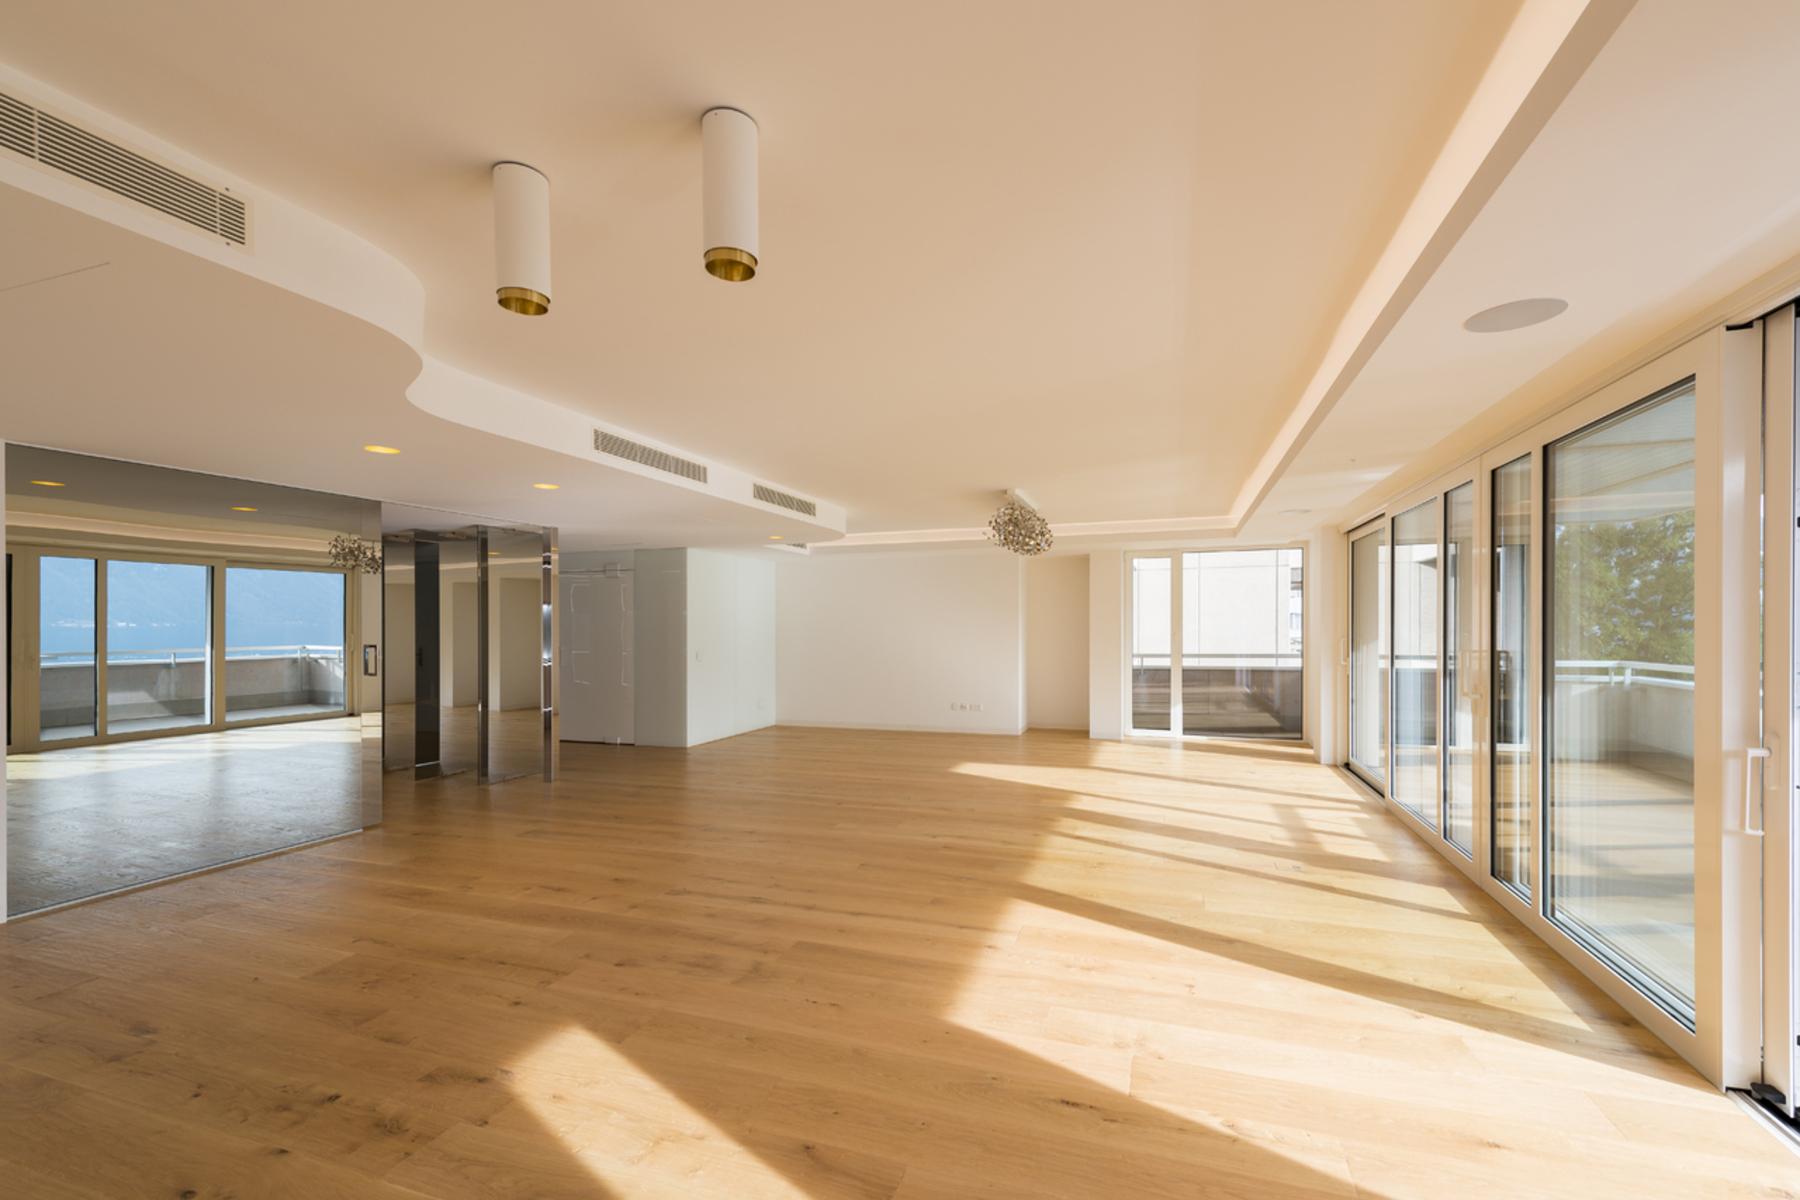 Apartment for Sale at Modern lakefront apartment Lugano, Lugano, Ticino, 6900 Switzerland